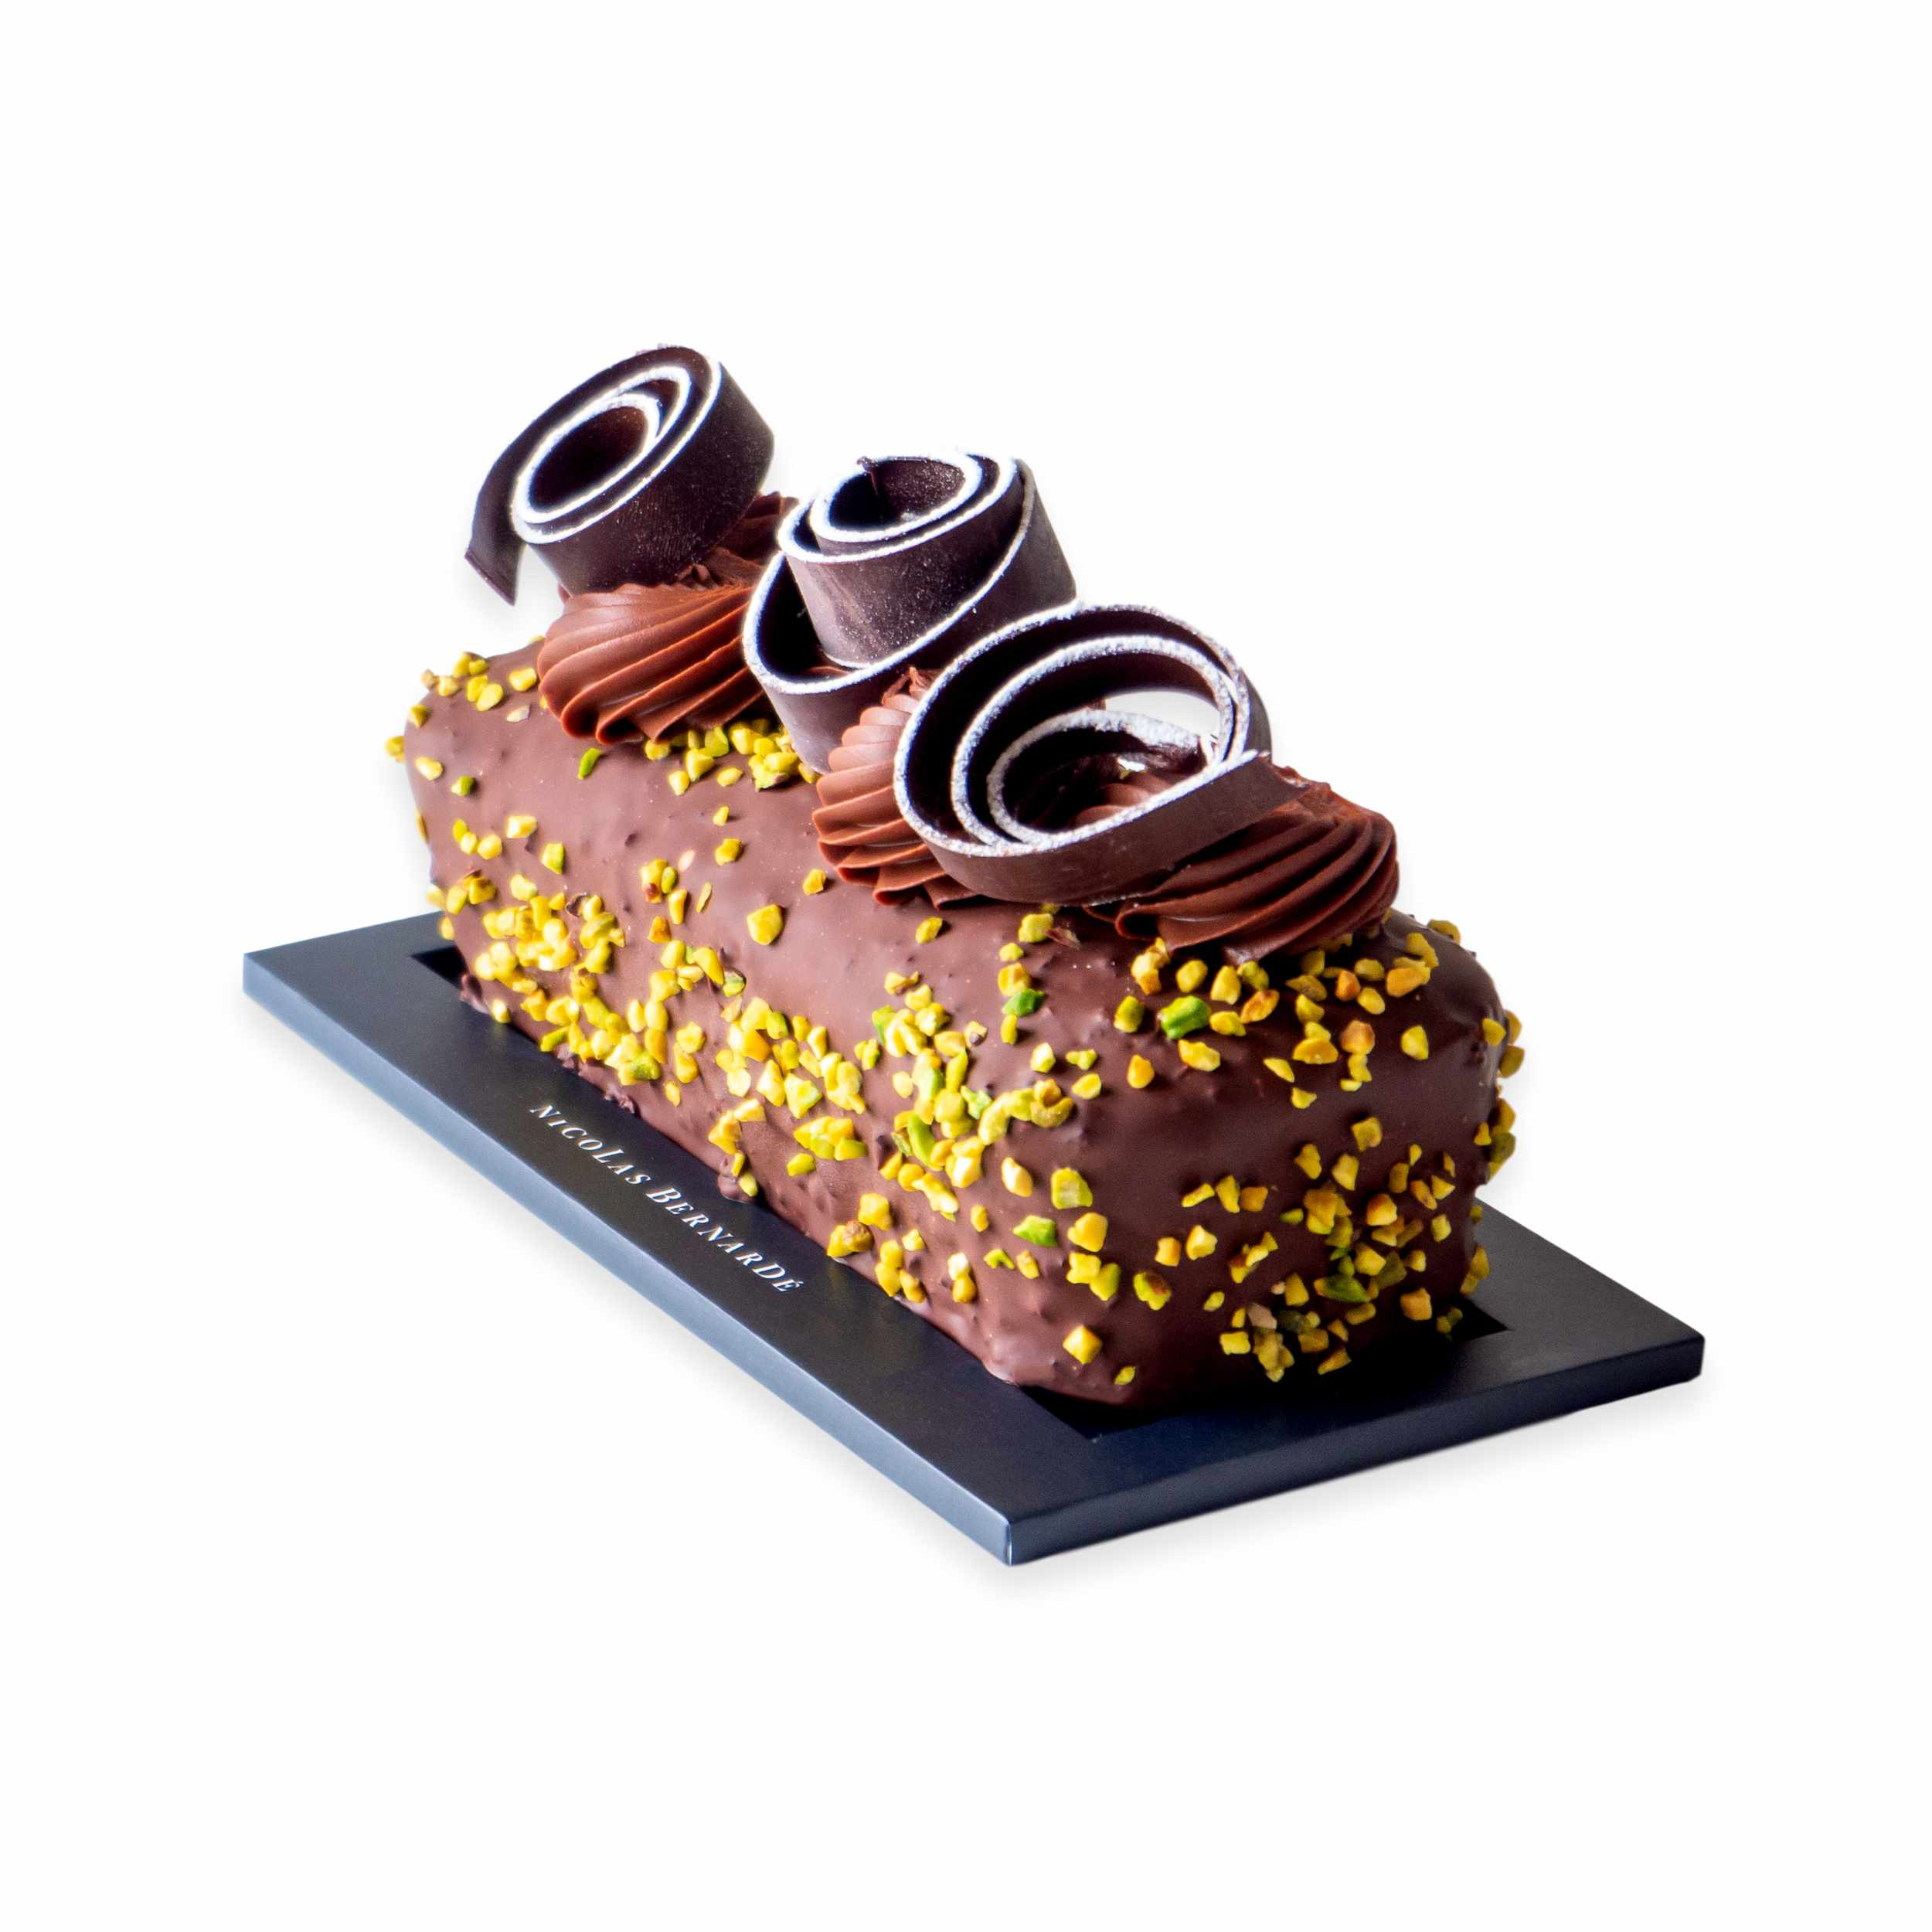 Cake-chocolat-pistache-enrobe